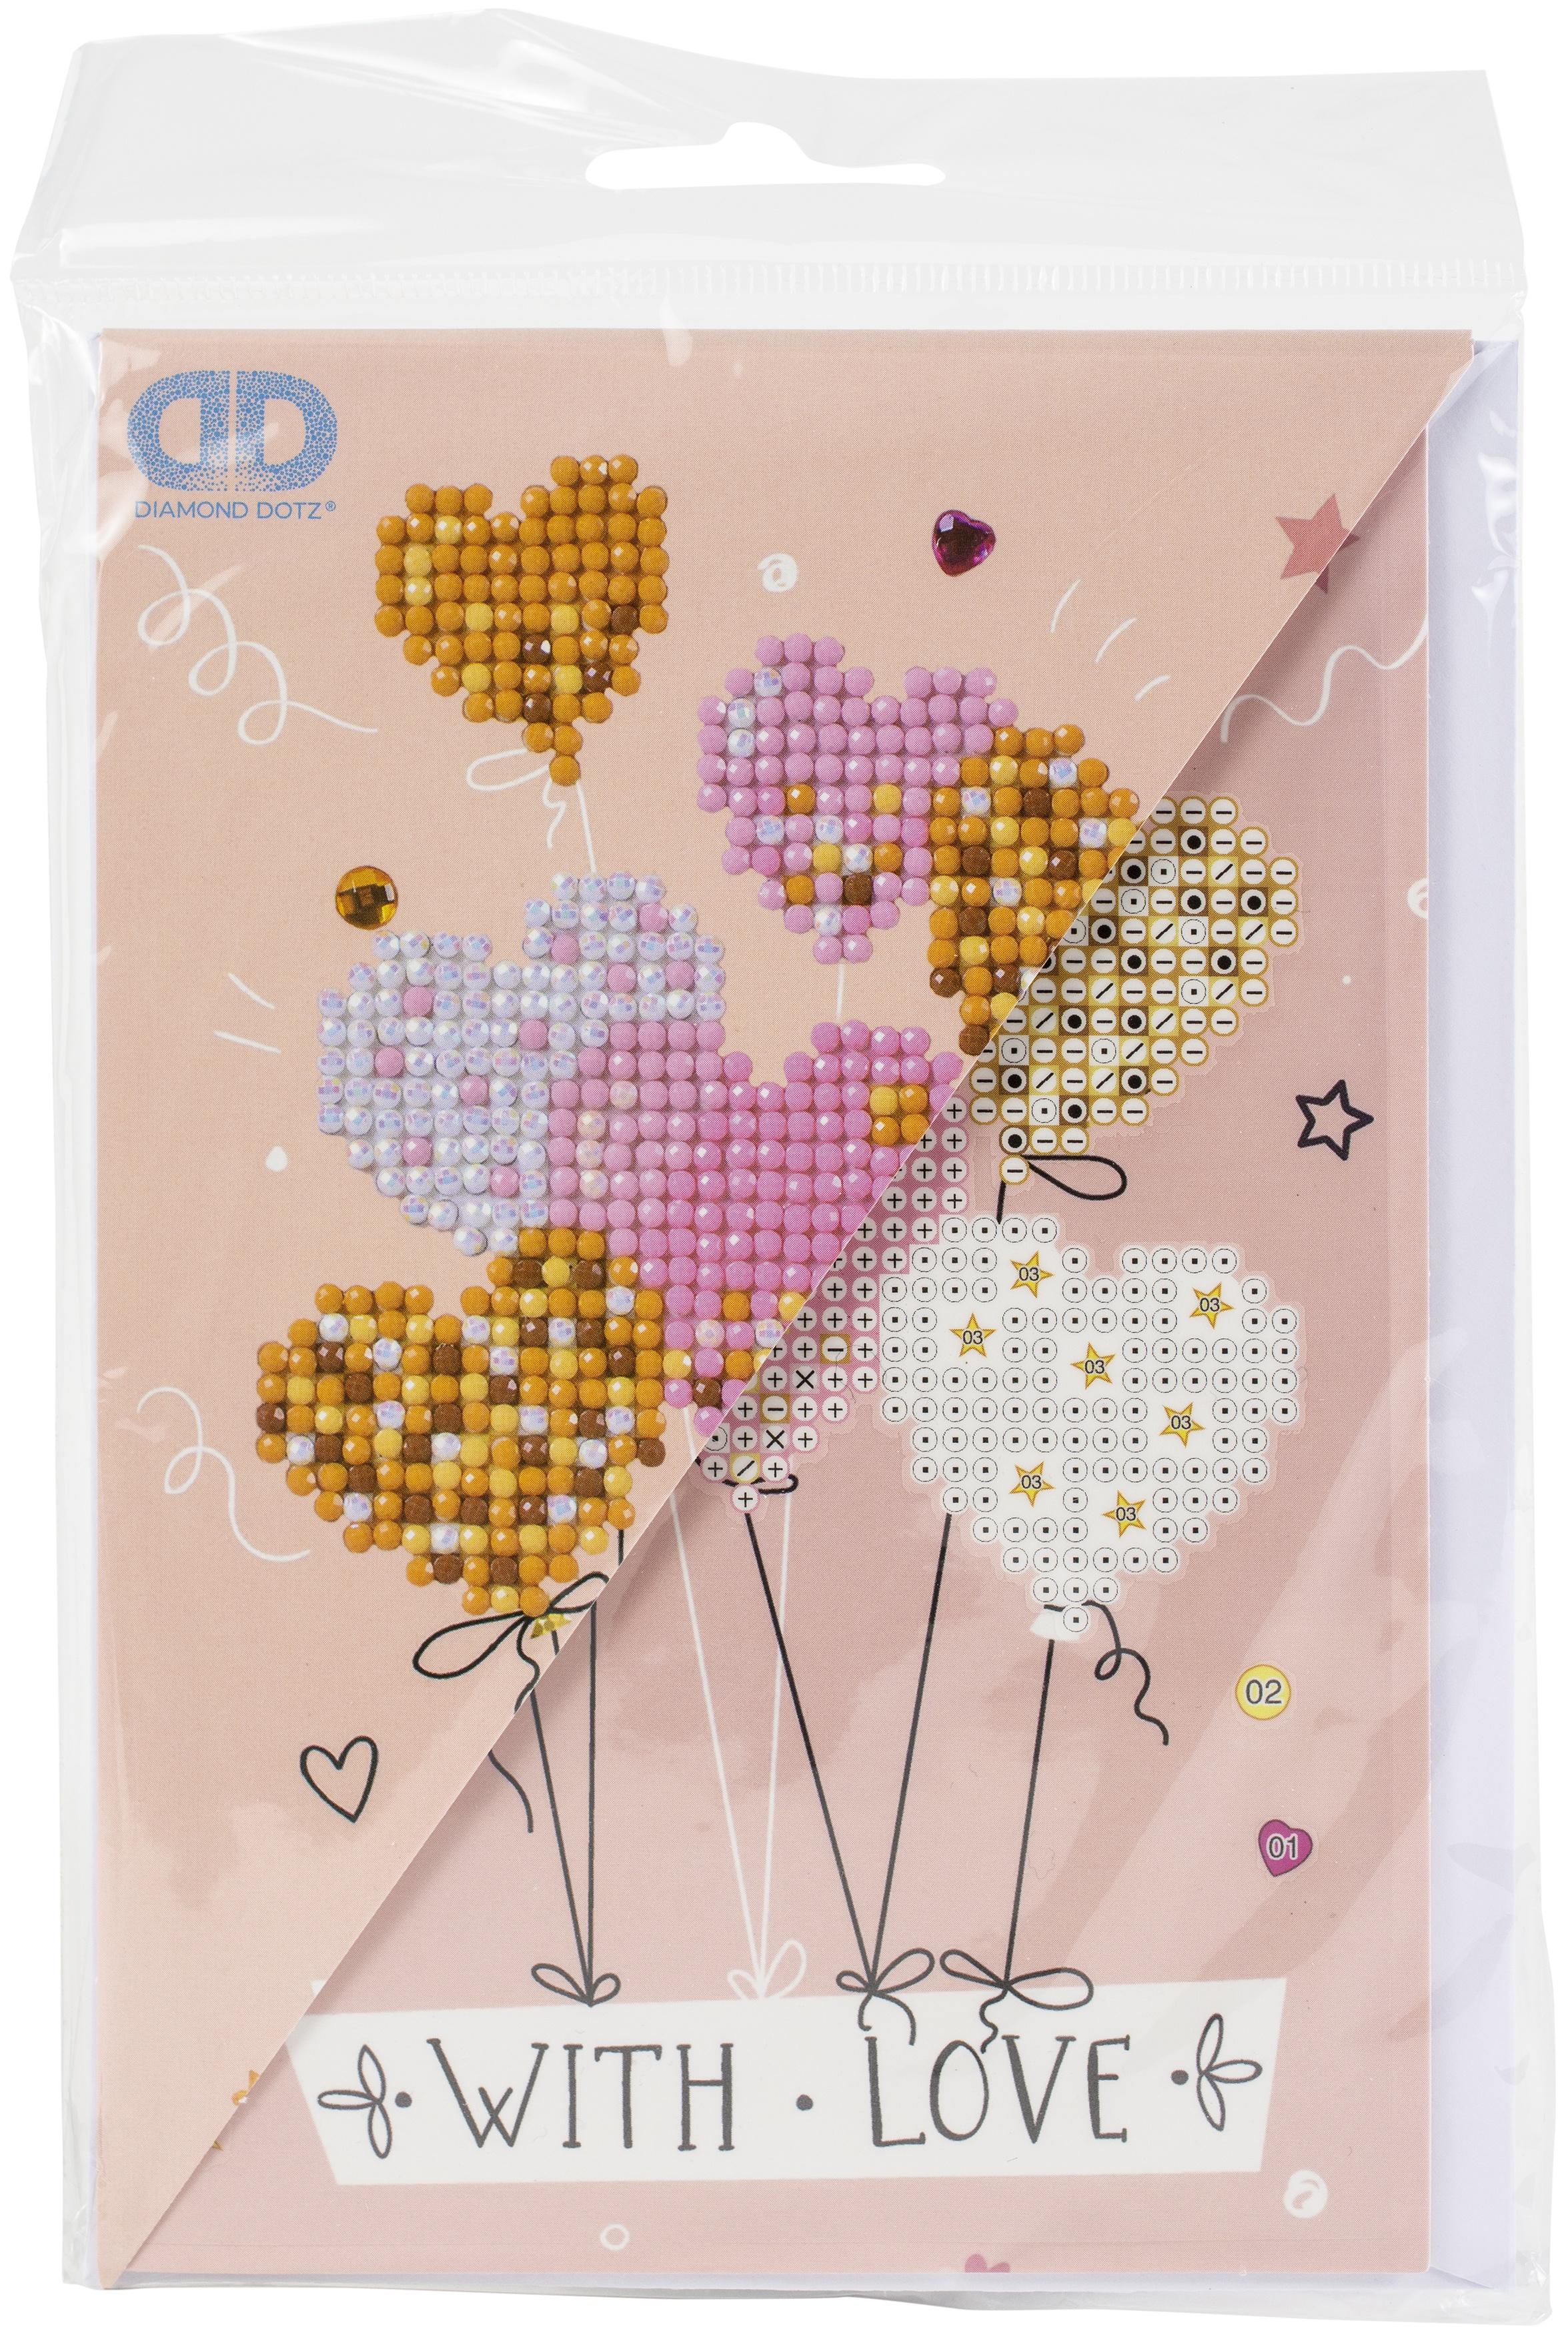 Diamond Dotz Diamond Embroidery Facet Art Greeting Card Kit - Love Balloons